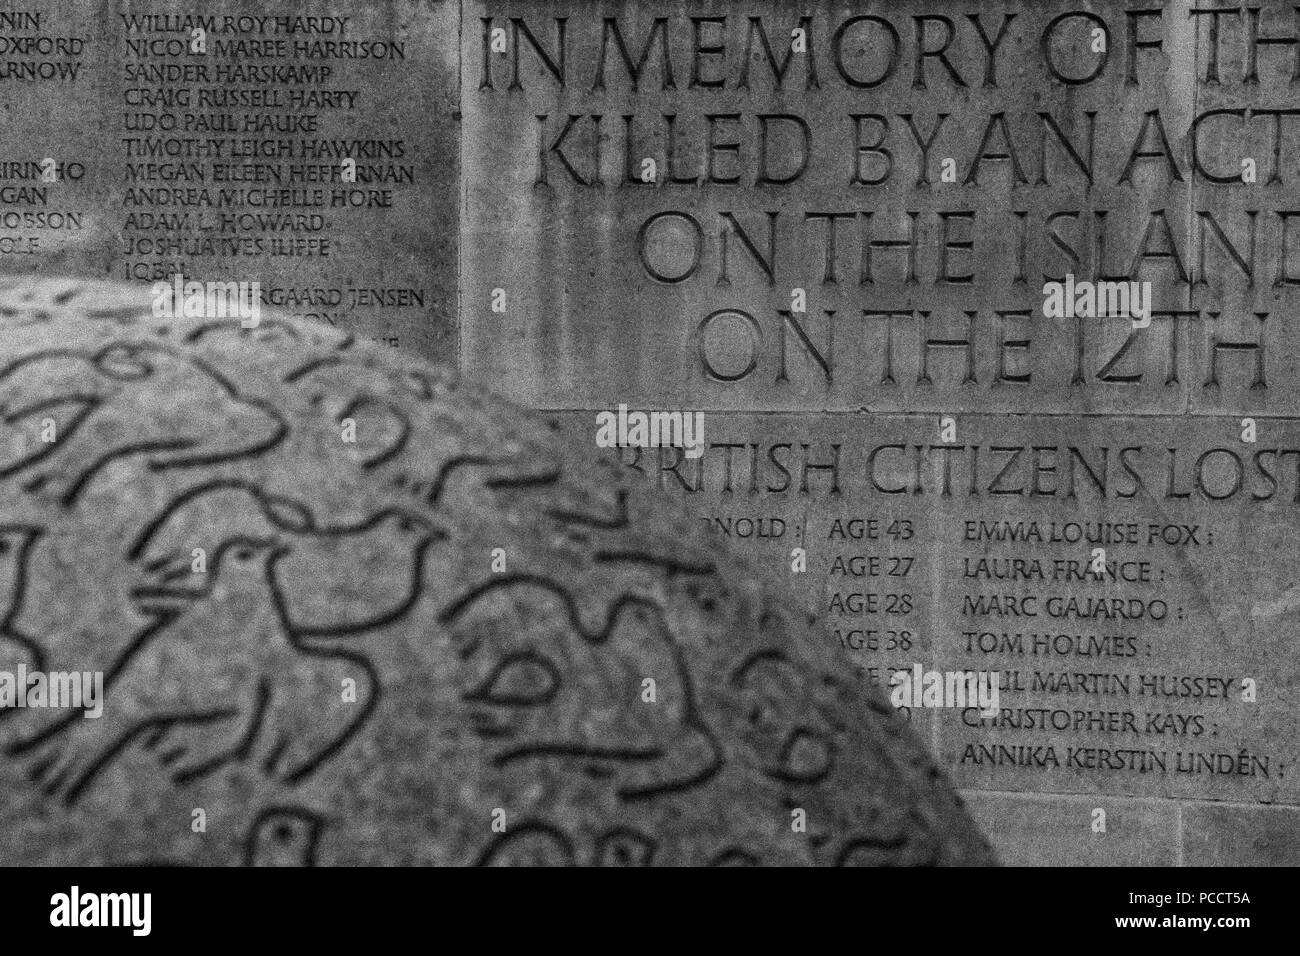 Circular stone memorial to the British victims of 2002 Kuta, Bali Bombings in London. Designed by Gary Breeze - Stock Image